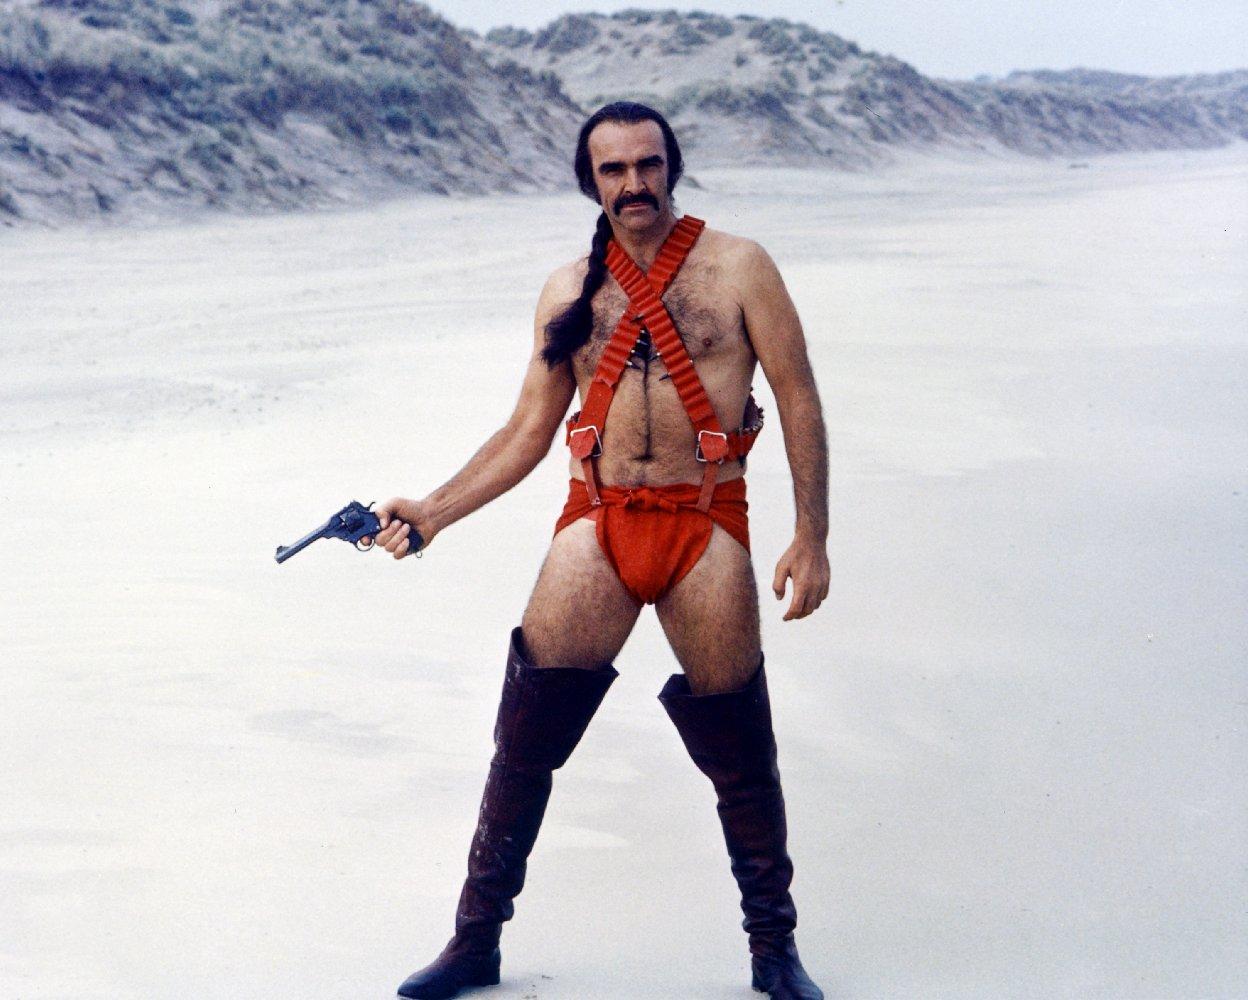 Zardoz de John Boorman / 1974 - Science-Fiction